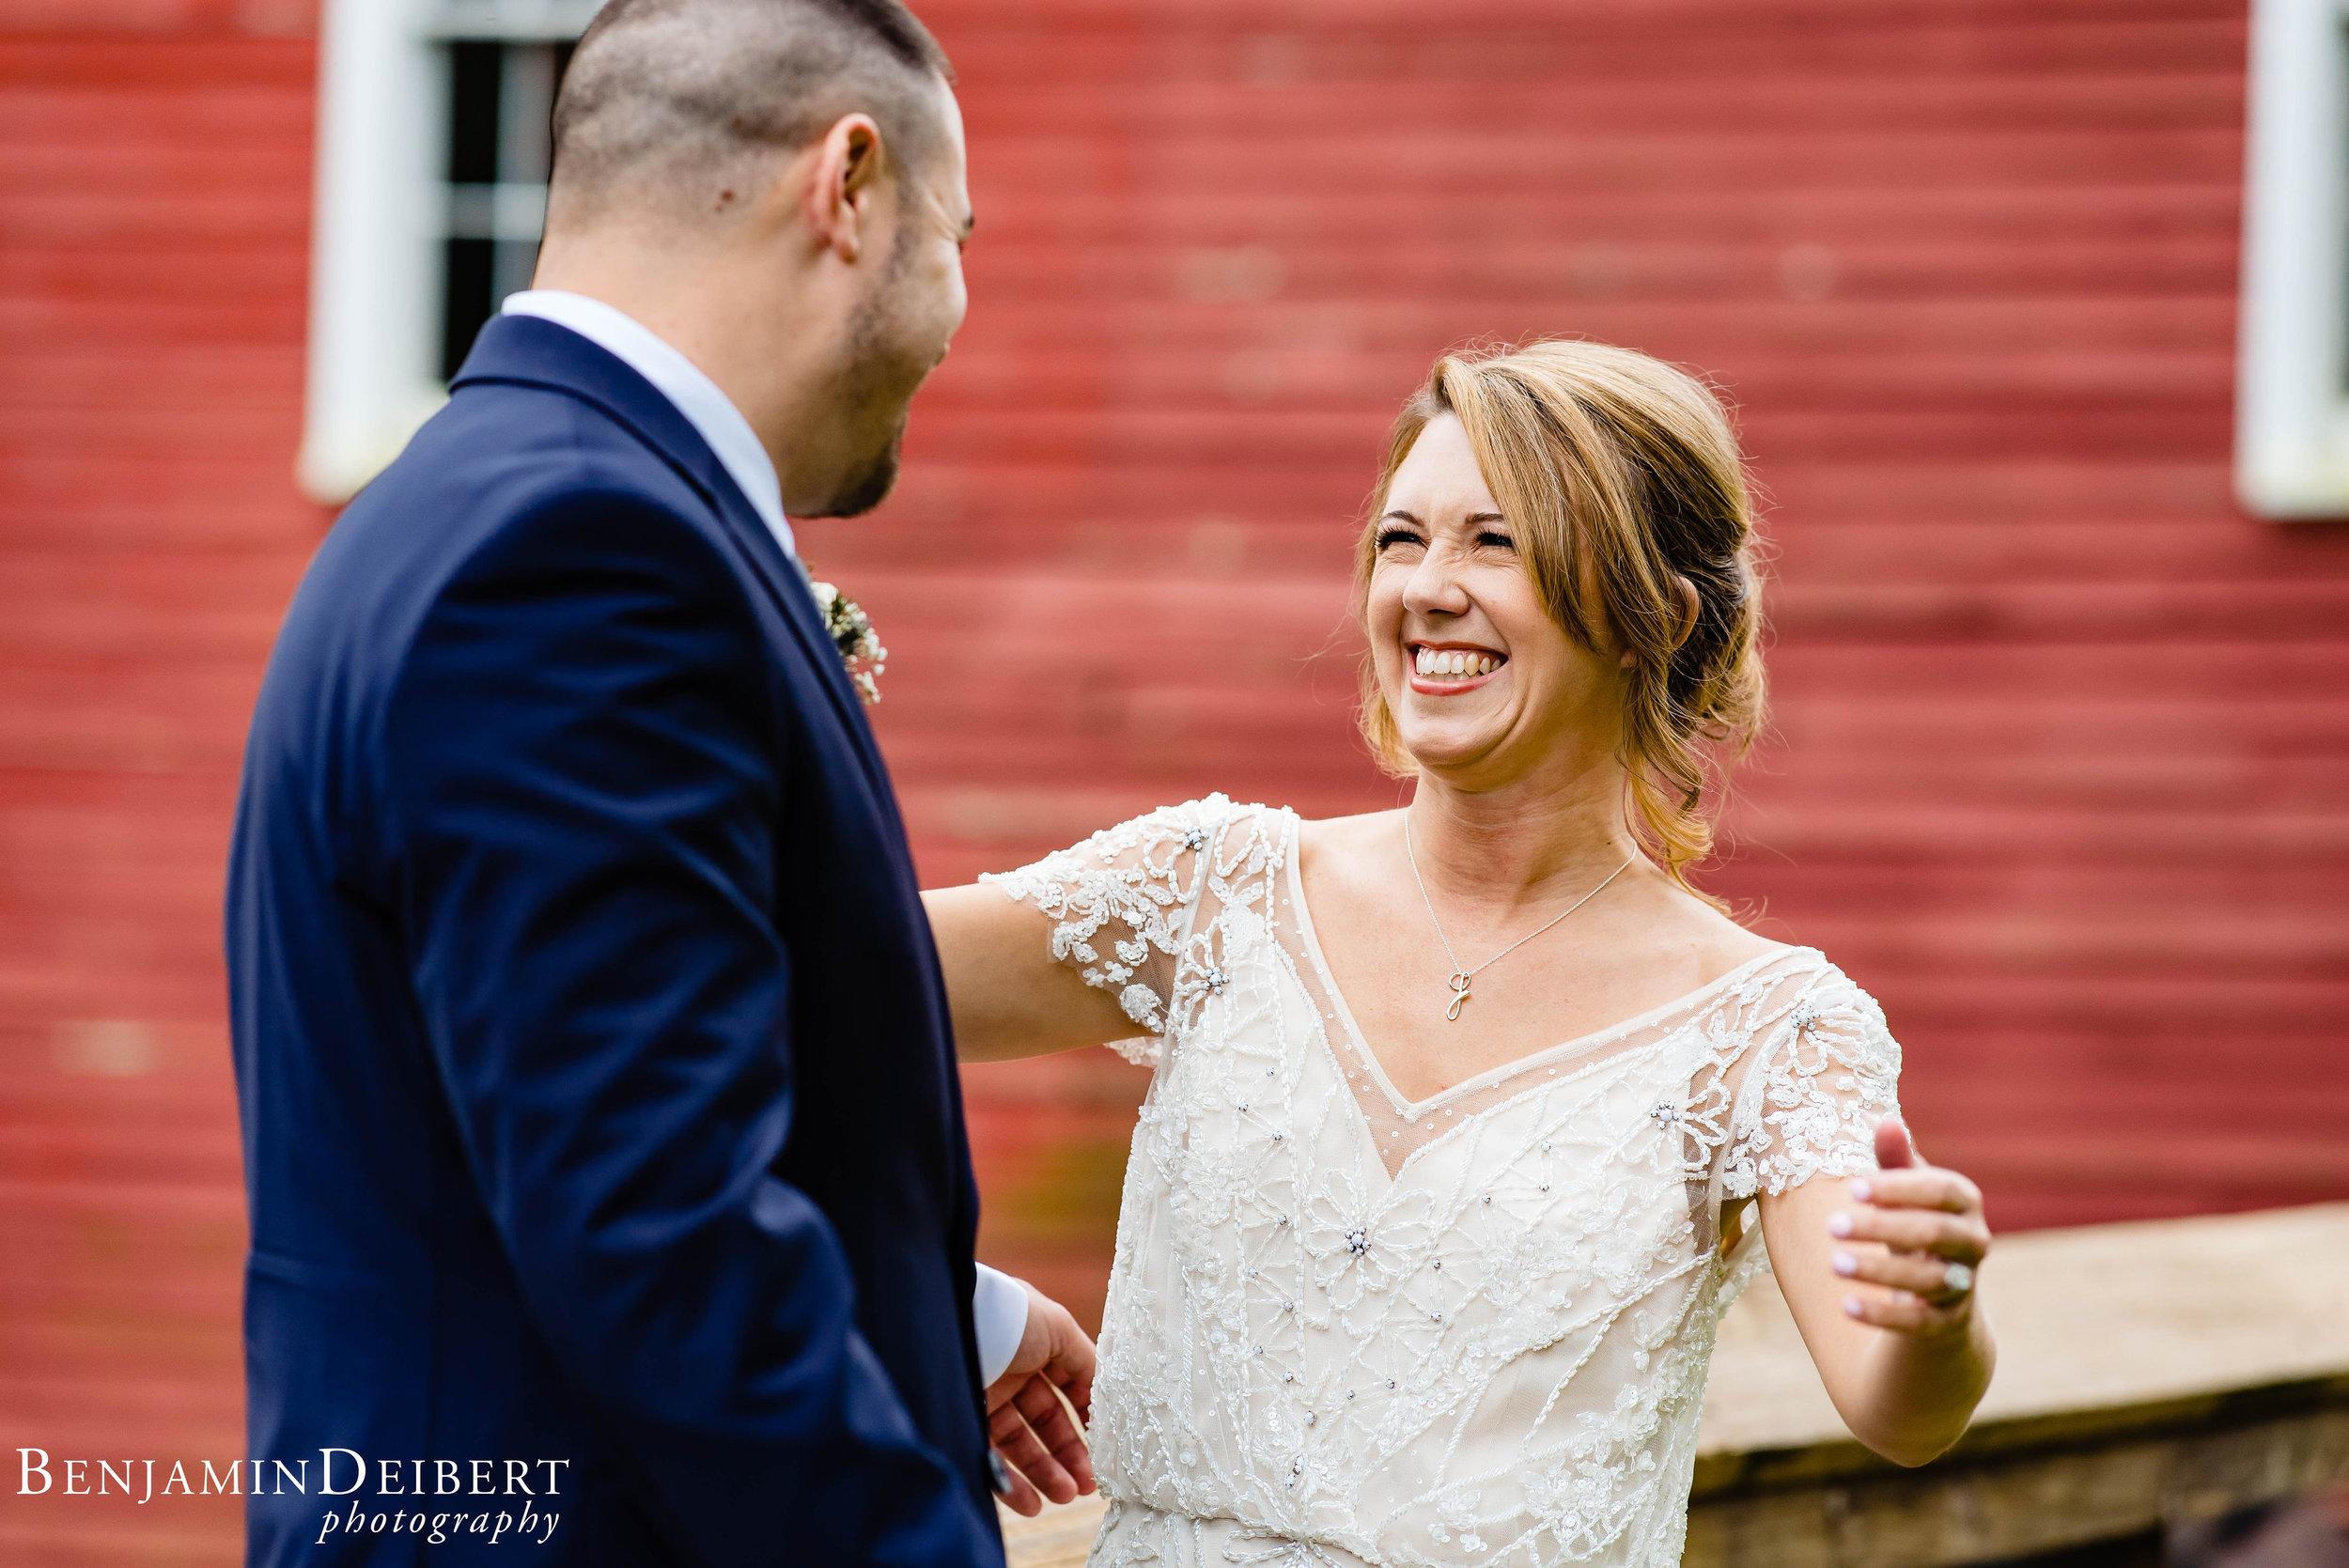 AllisonandMatt_BradfordEstate_Wedding-19.jpg